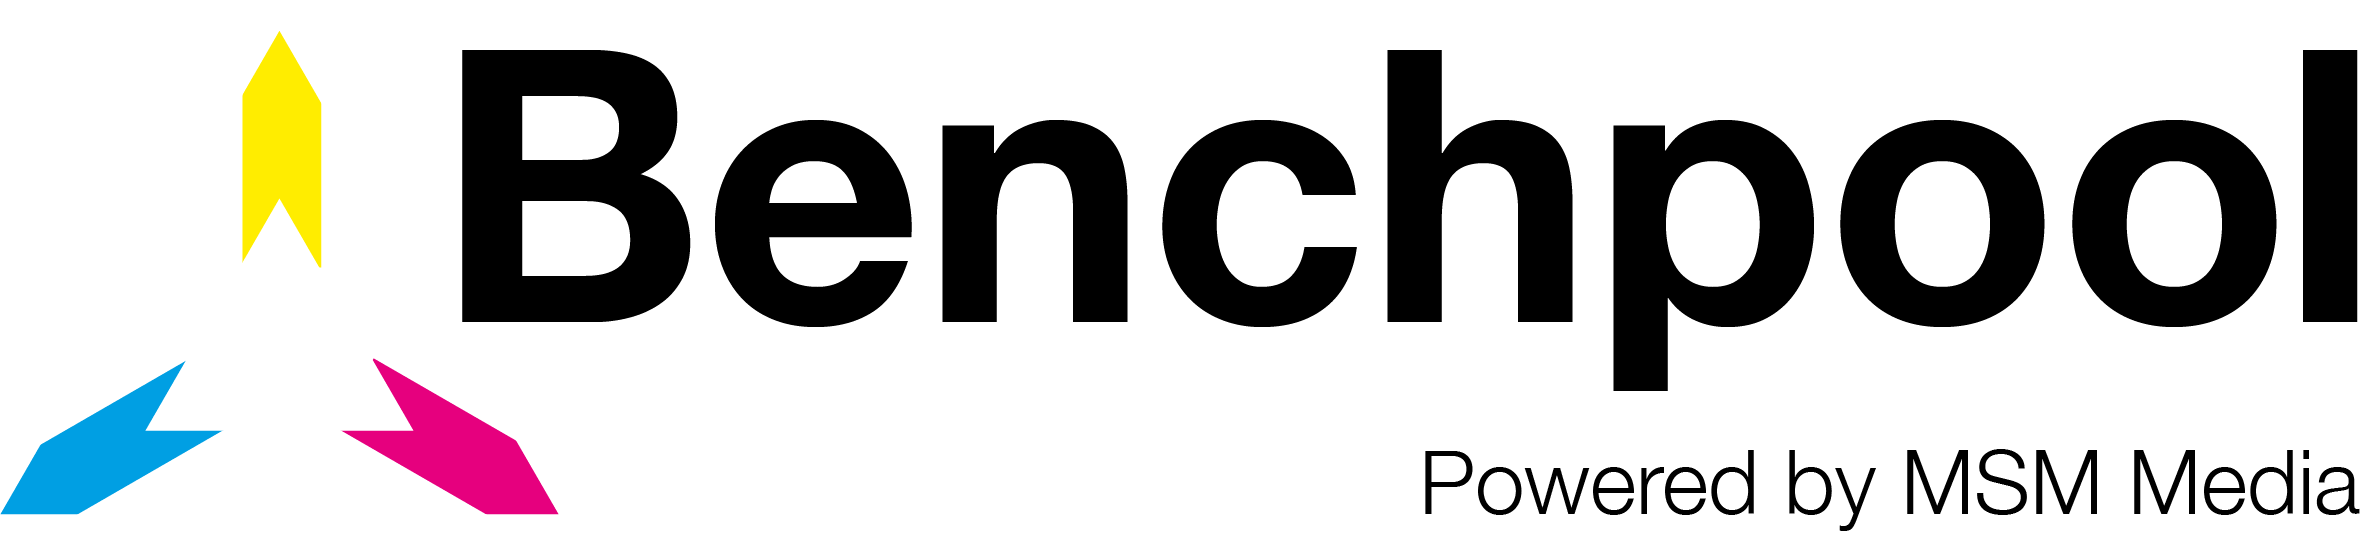 Benchpool